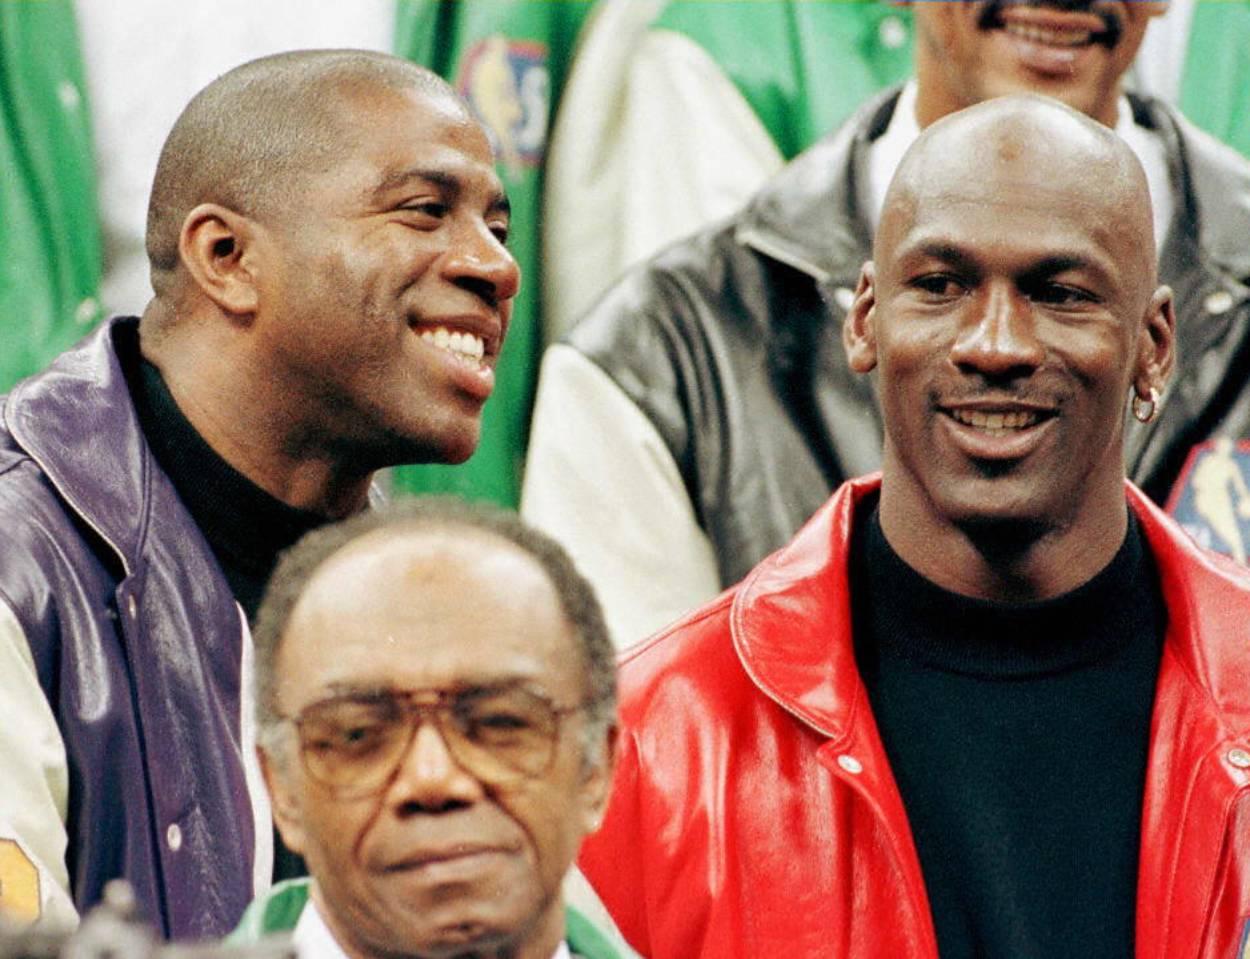 NBA legends Magic Johnson (L) and Michael Jordan.